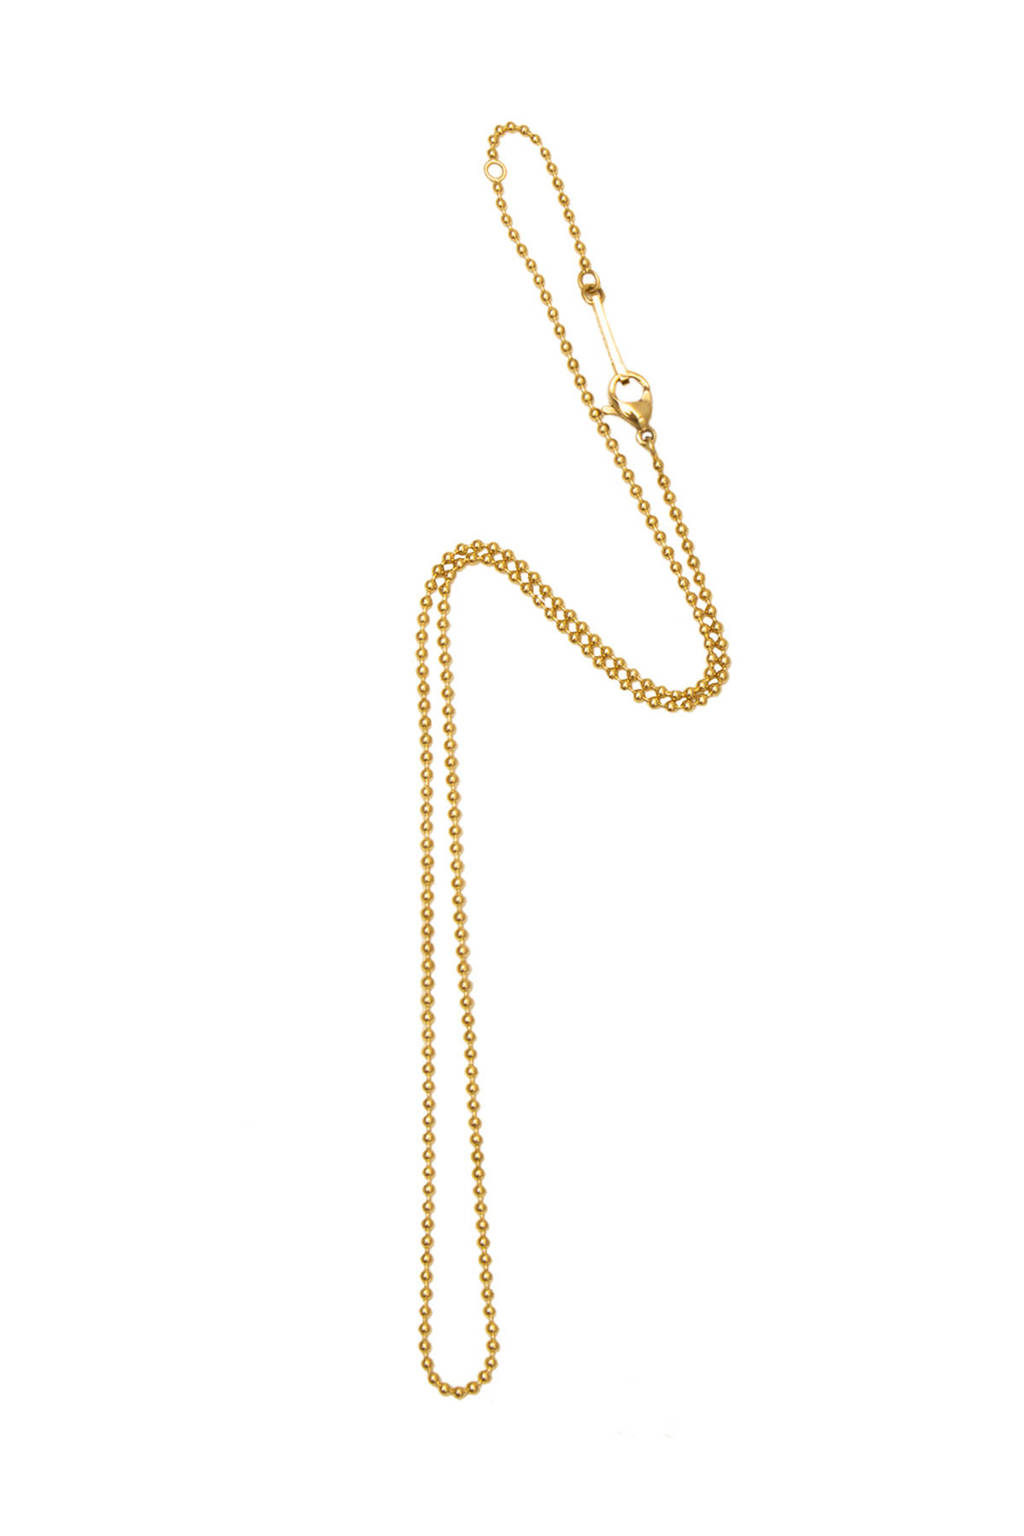 Bandhu ketting Small ball Chain 14K gold plated, Goud